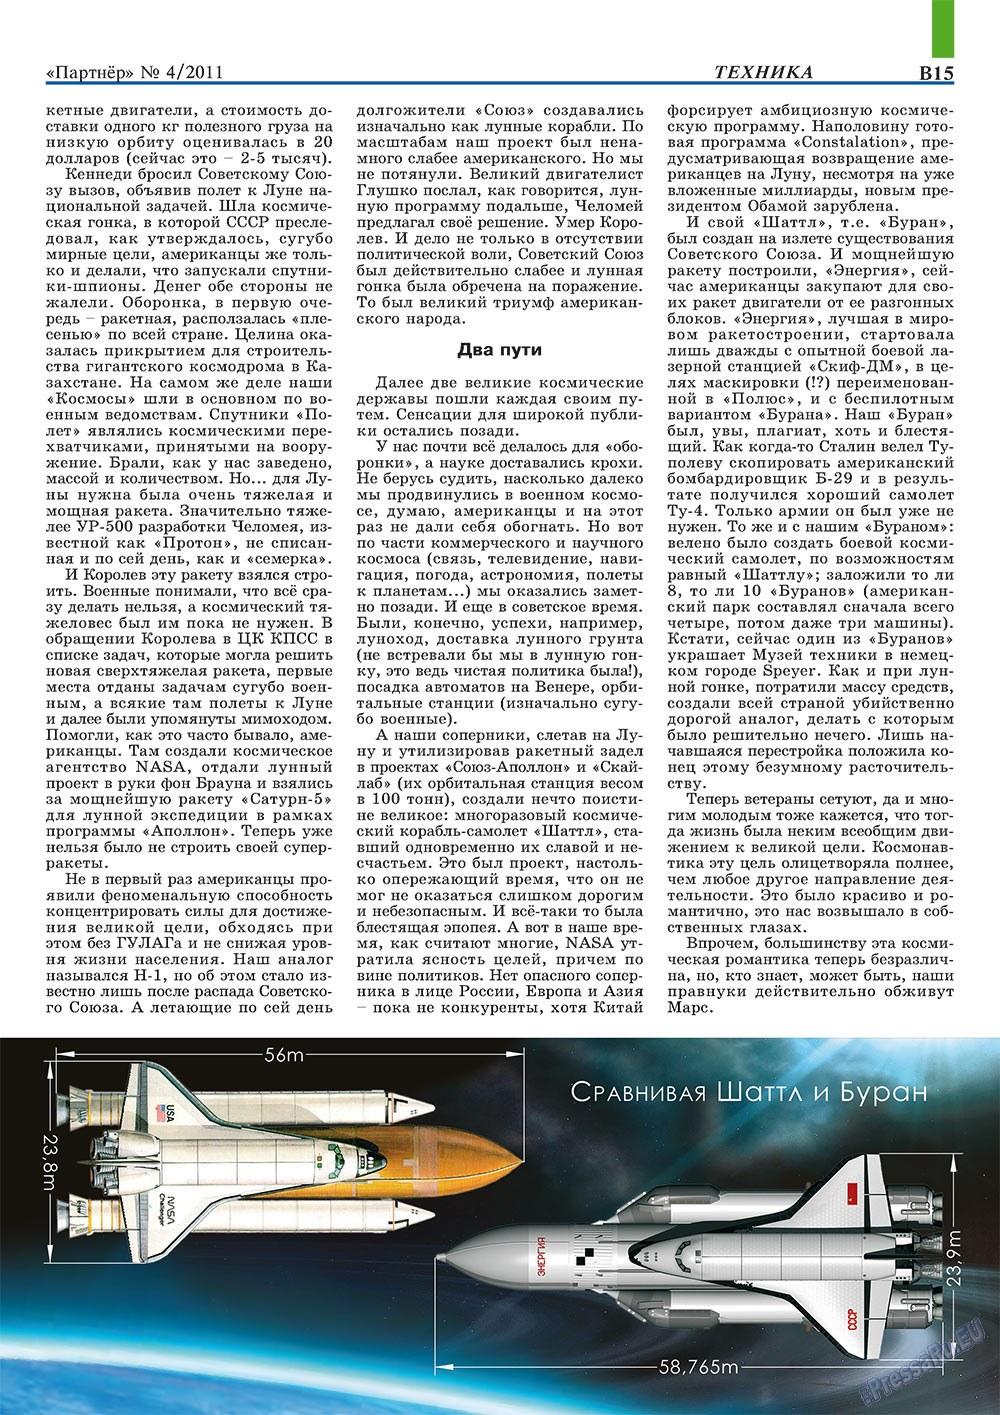 Партнер-север (журнал). 2011 год, номер 4, стр. 25